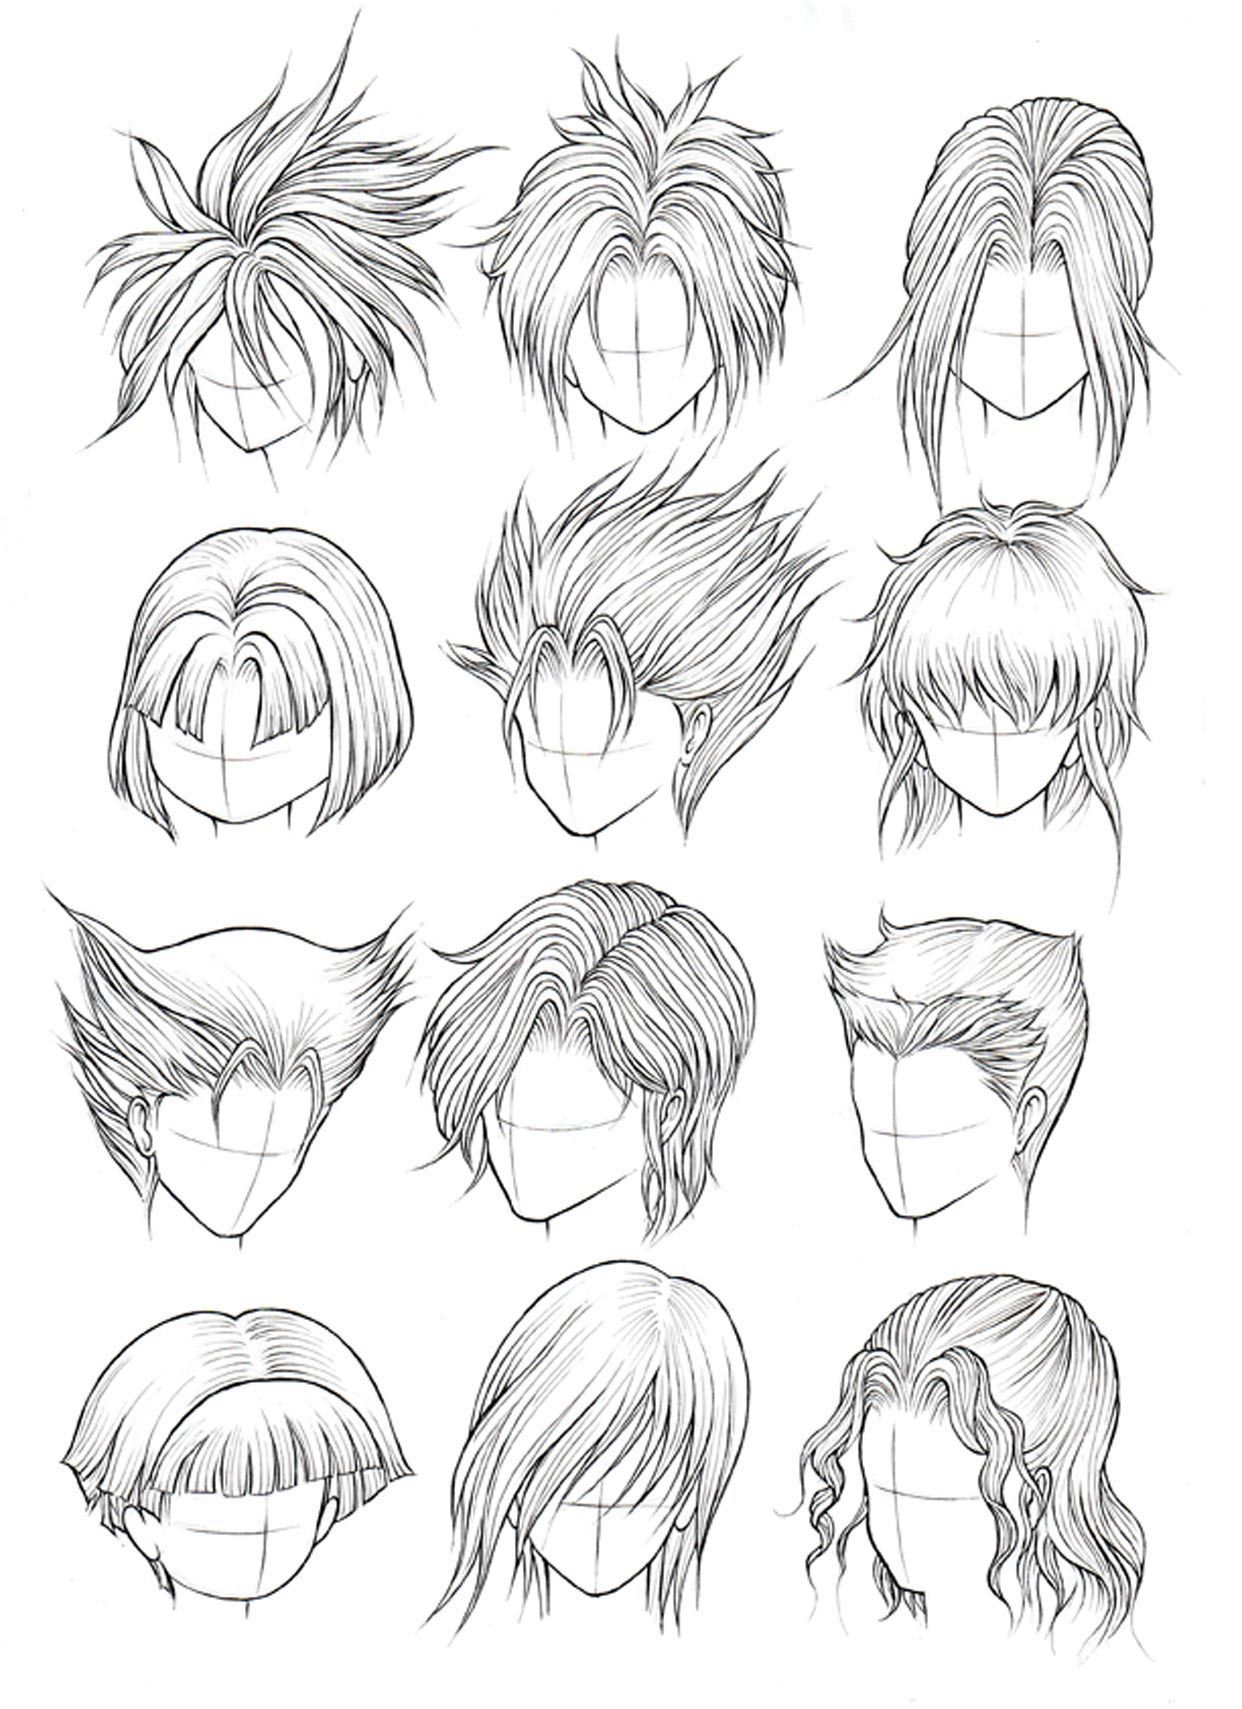 Kanji de manga vol 3 cover image manga hair anime